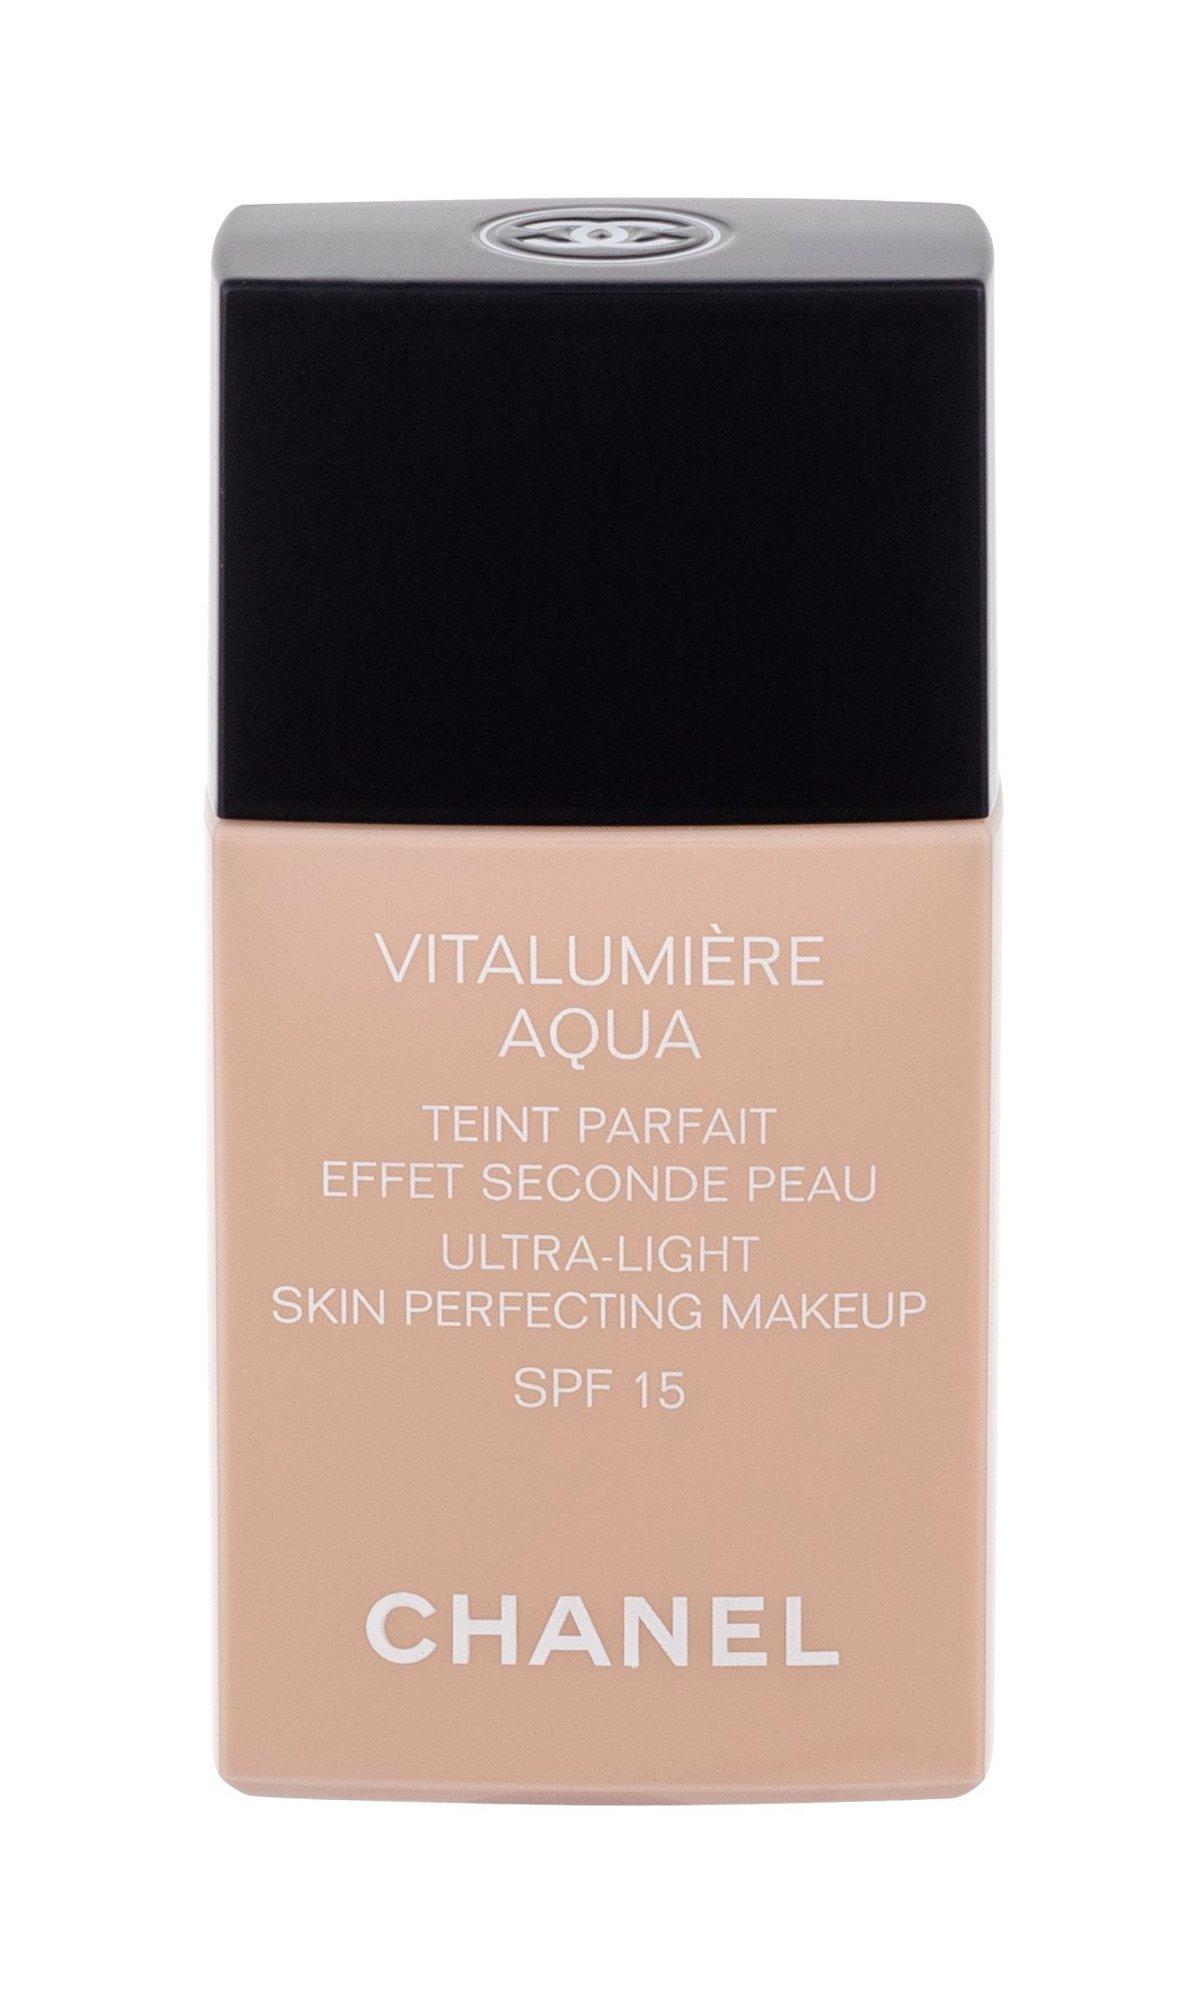 Chanel Vitalumiere Aqua Makeup 30ml 40 Beige